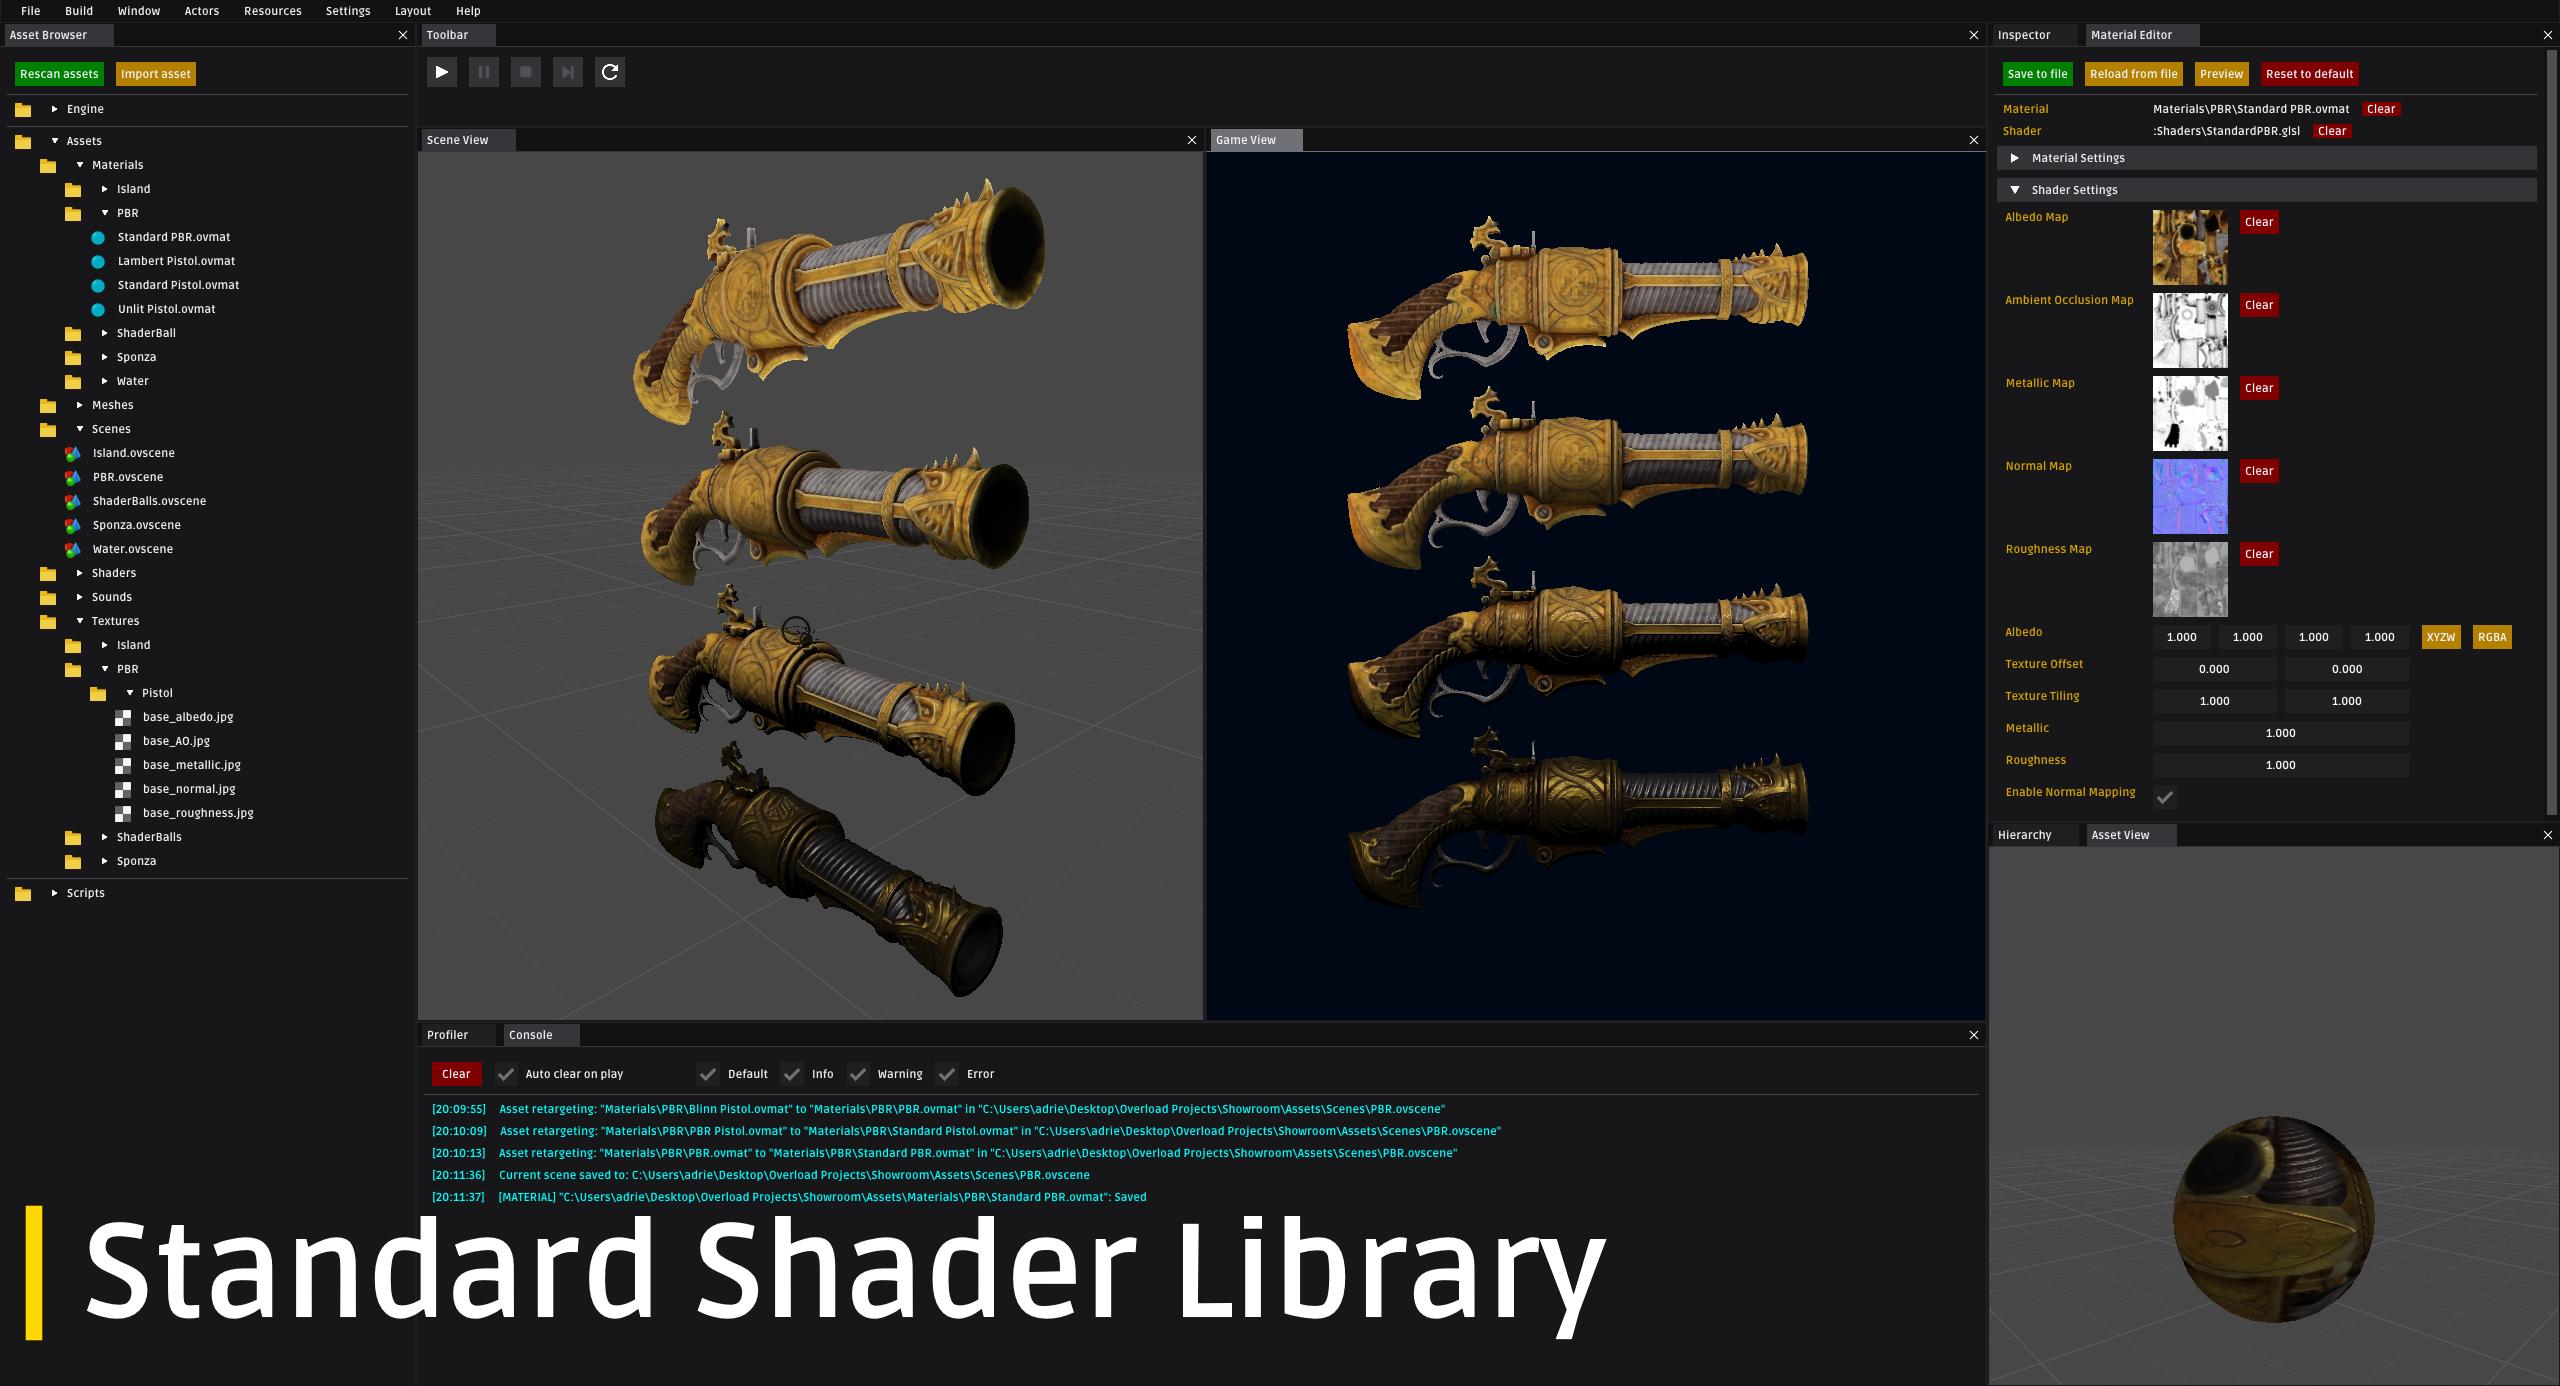 Standard Shader Library